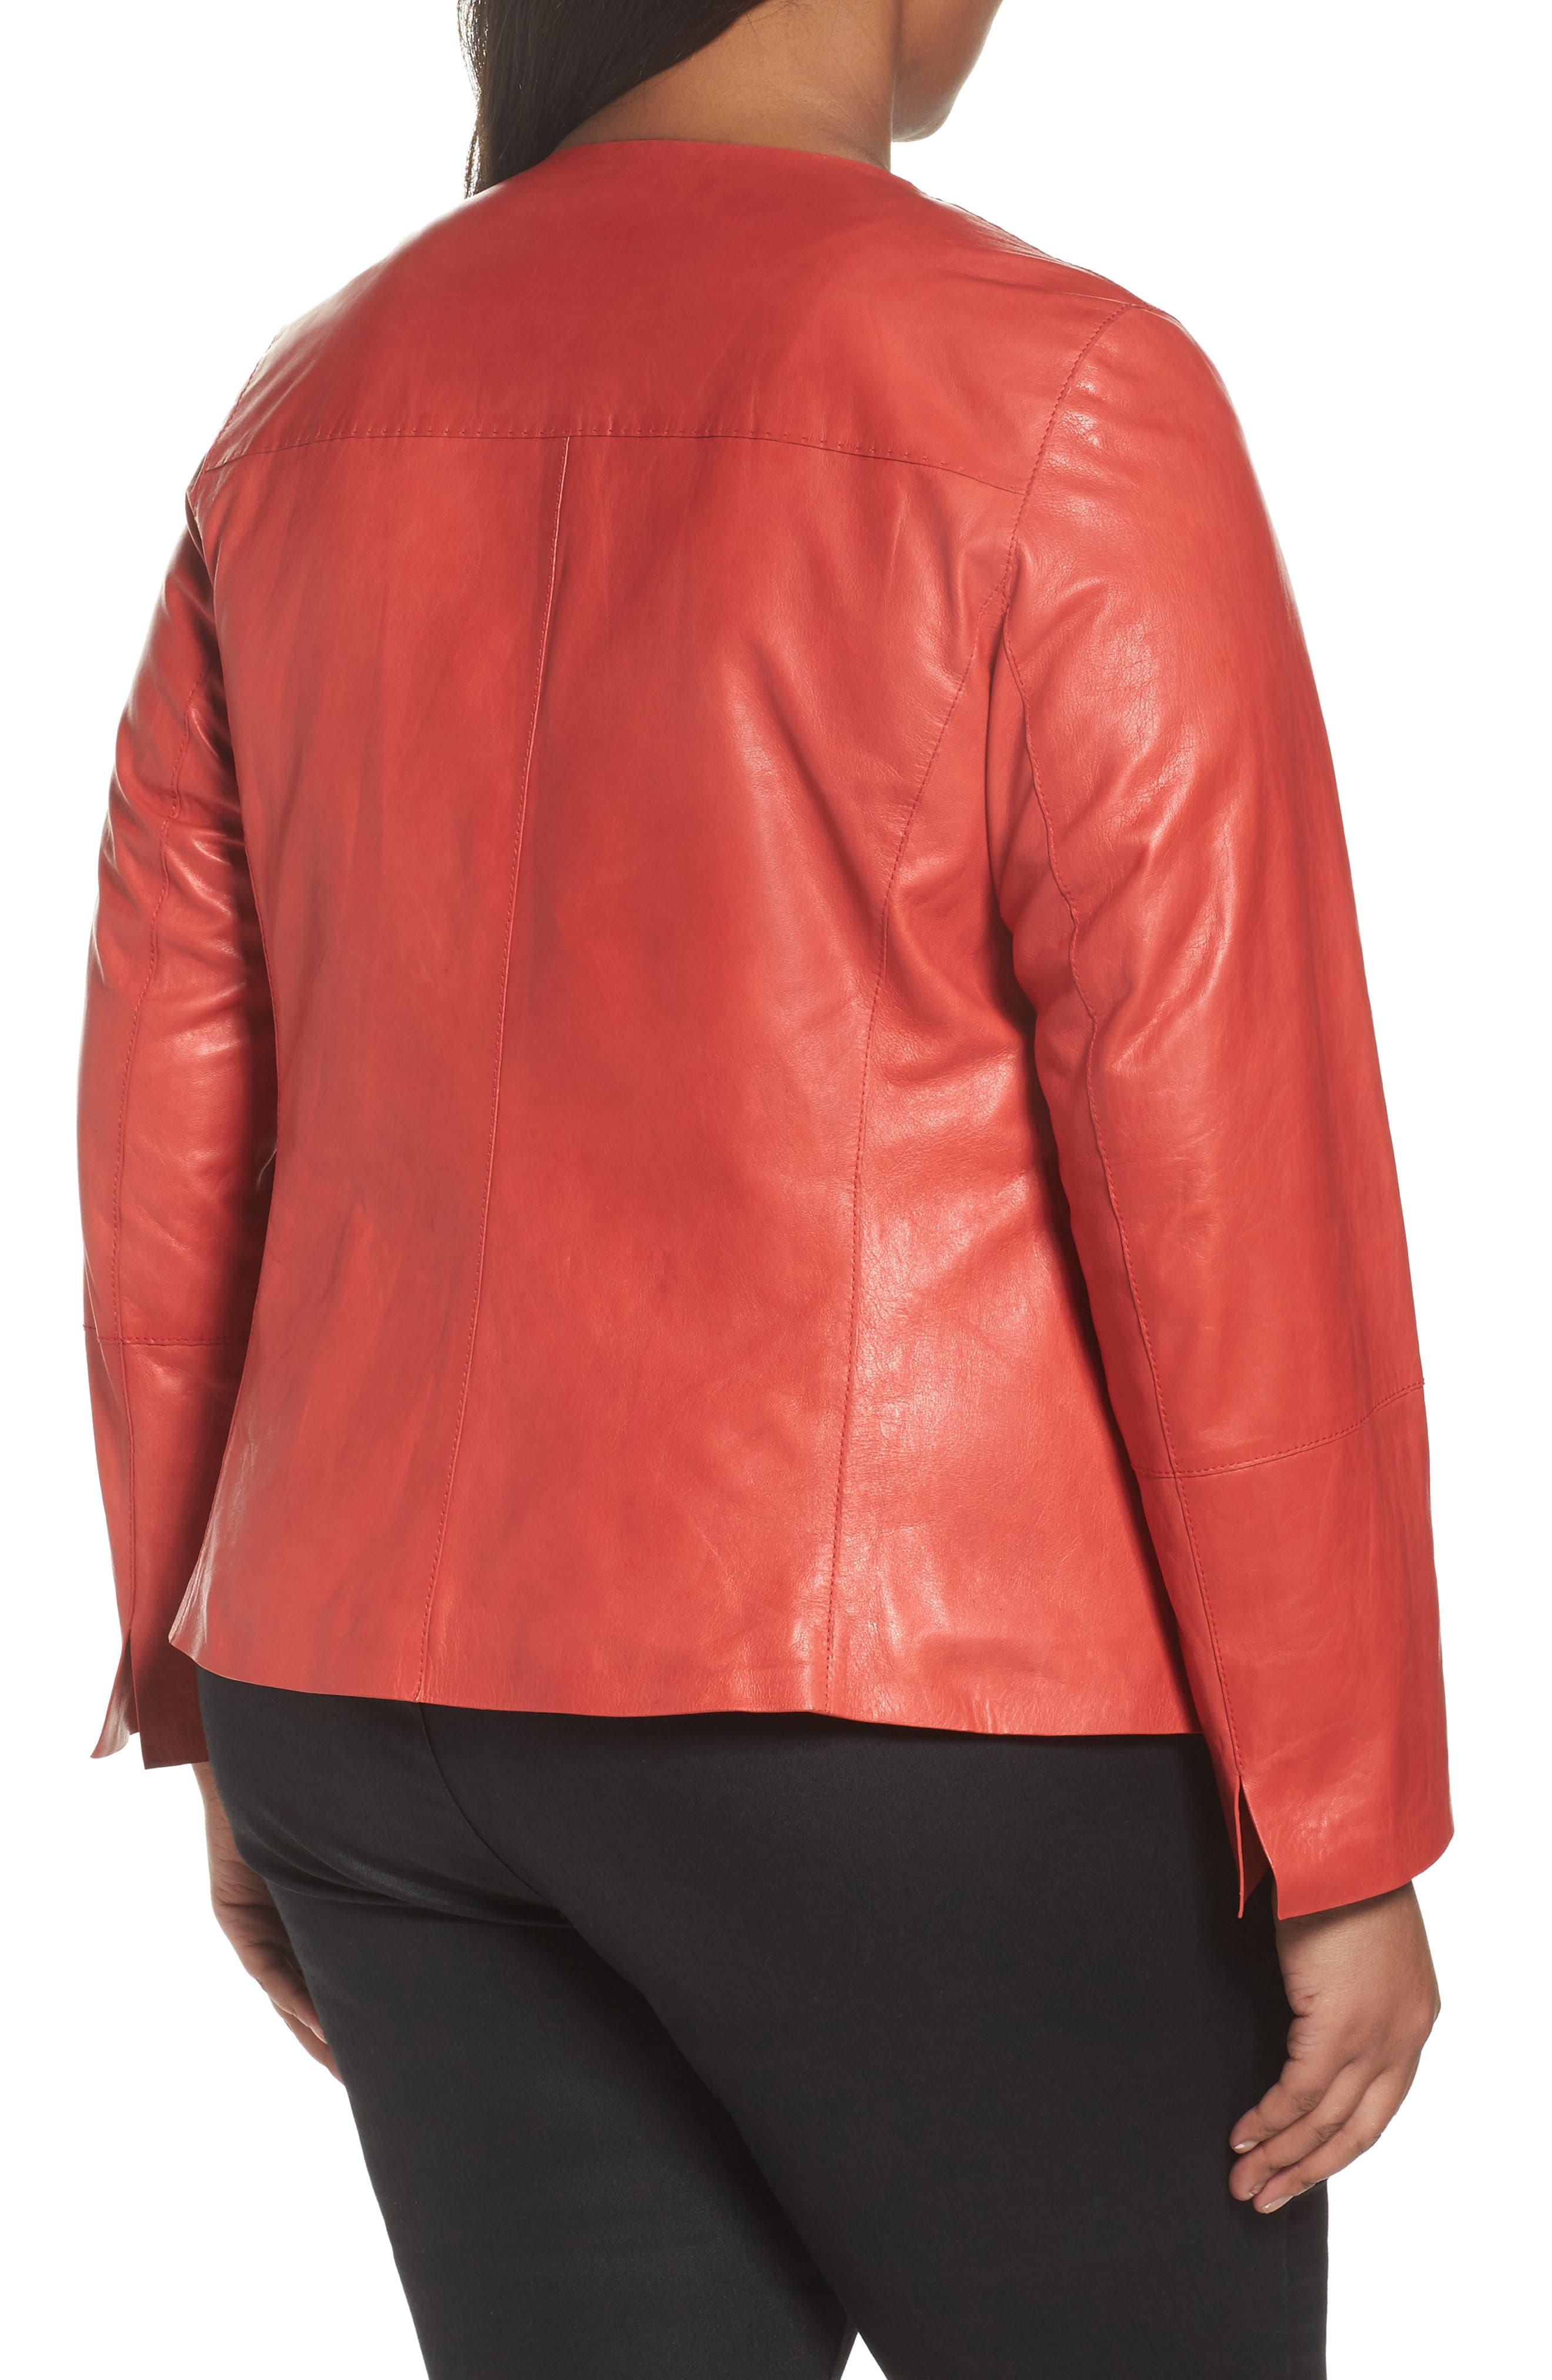 Caridee Glazed Lambskin Leather Jacket,                             Alternate thumbnail 2, color,                             604